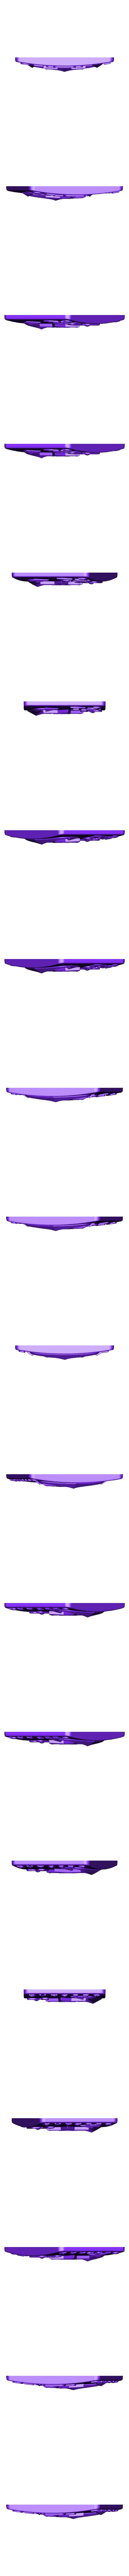 BLAHA2.stl Download free STL file Солдатские бляхи на 23 февраля (belt buckle) • Model to 3D print, shuranikishin